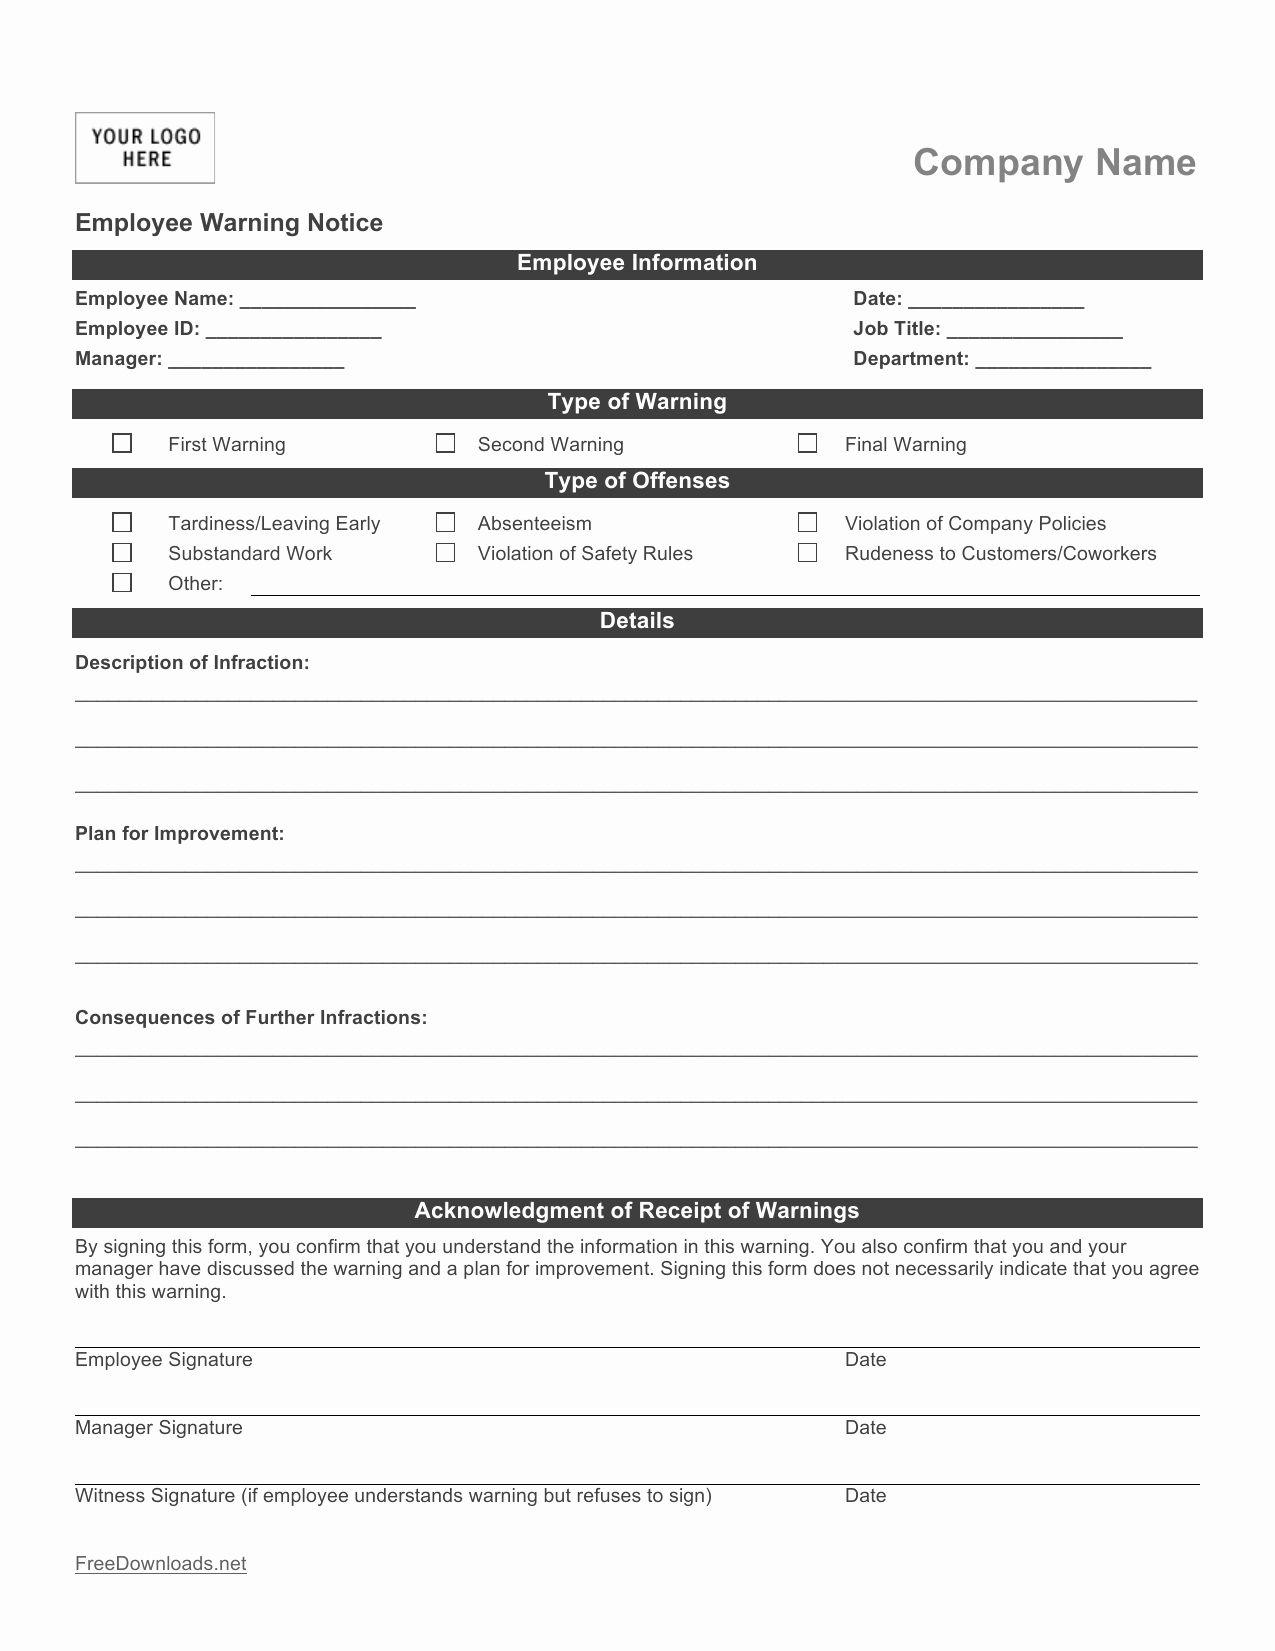 Free Printable Employee Write Up Form Beautiful Download Employee Write Up Form Pdf Rtf Funeral Program Template Templates Writing